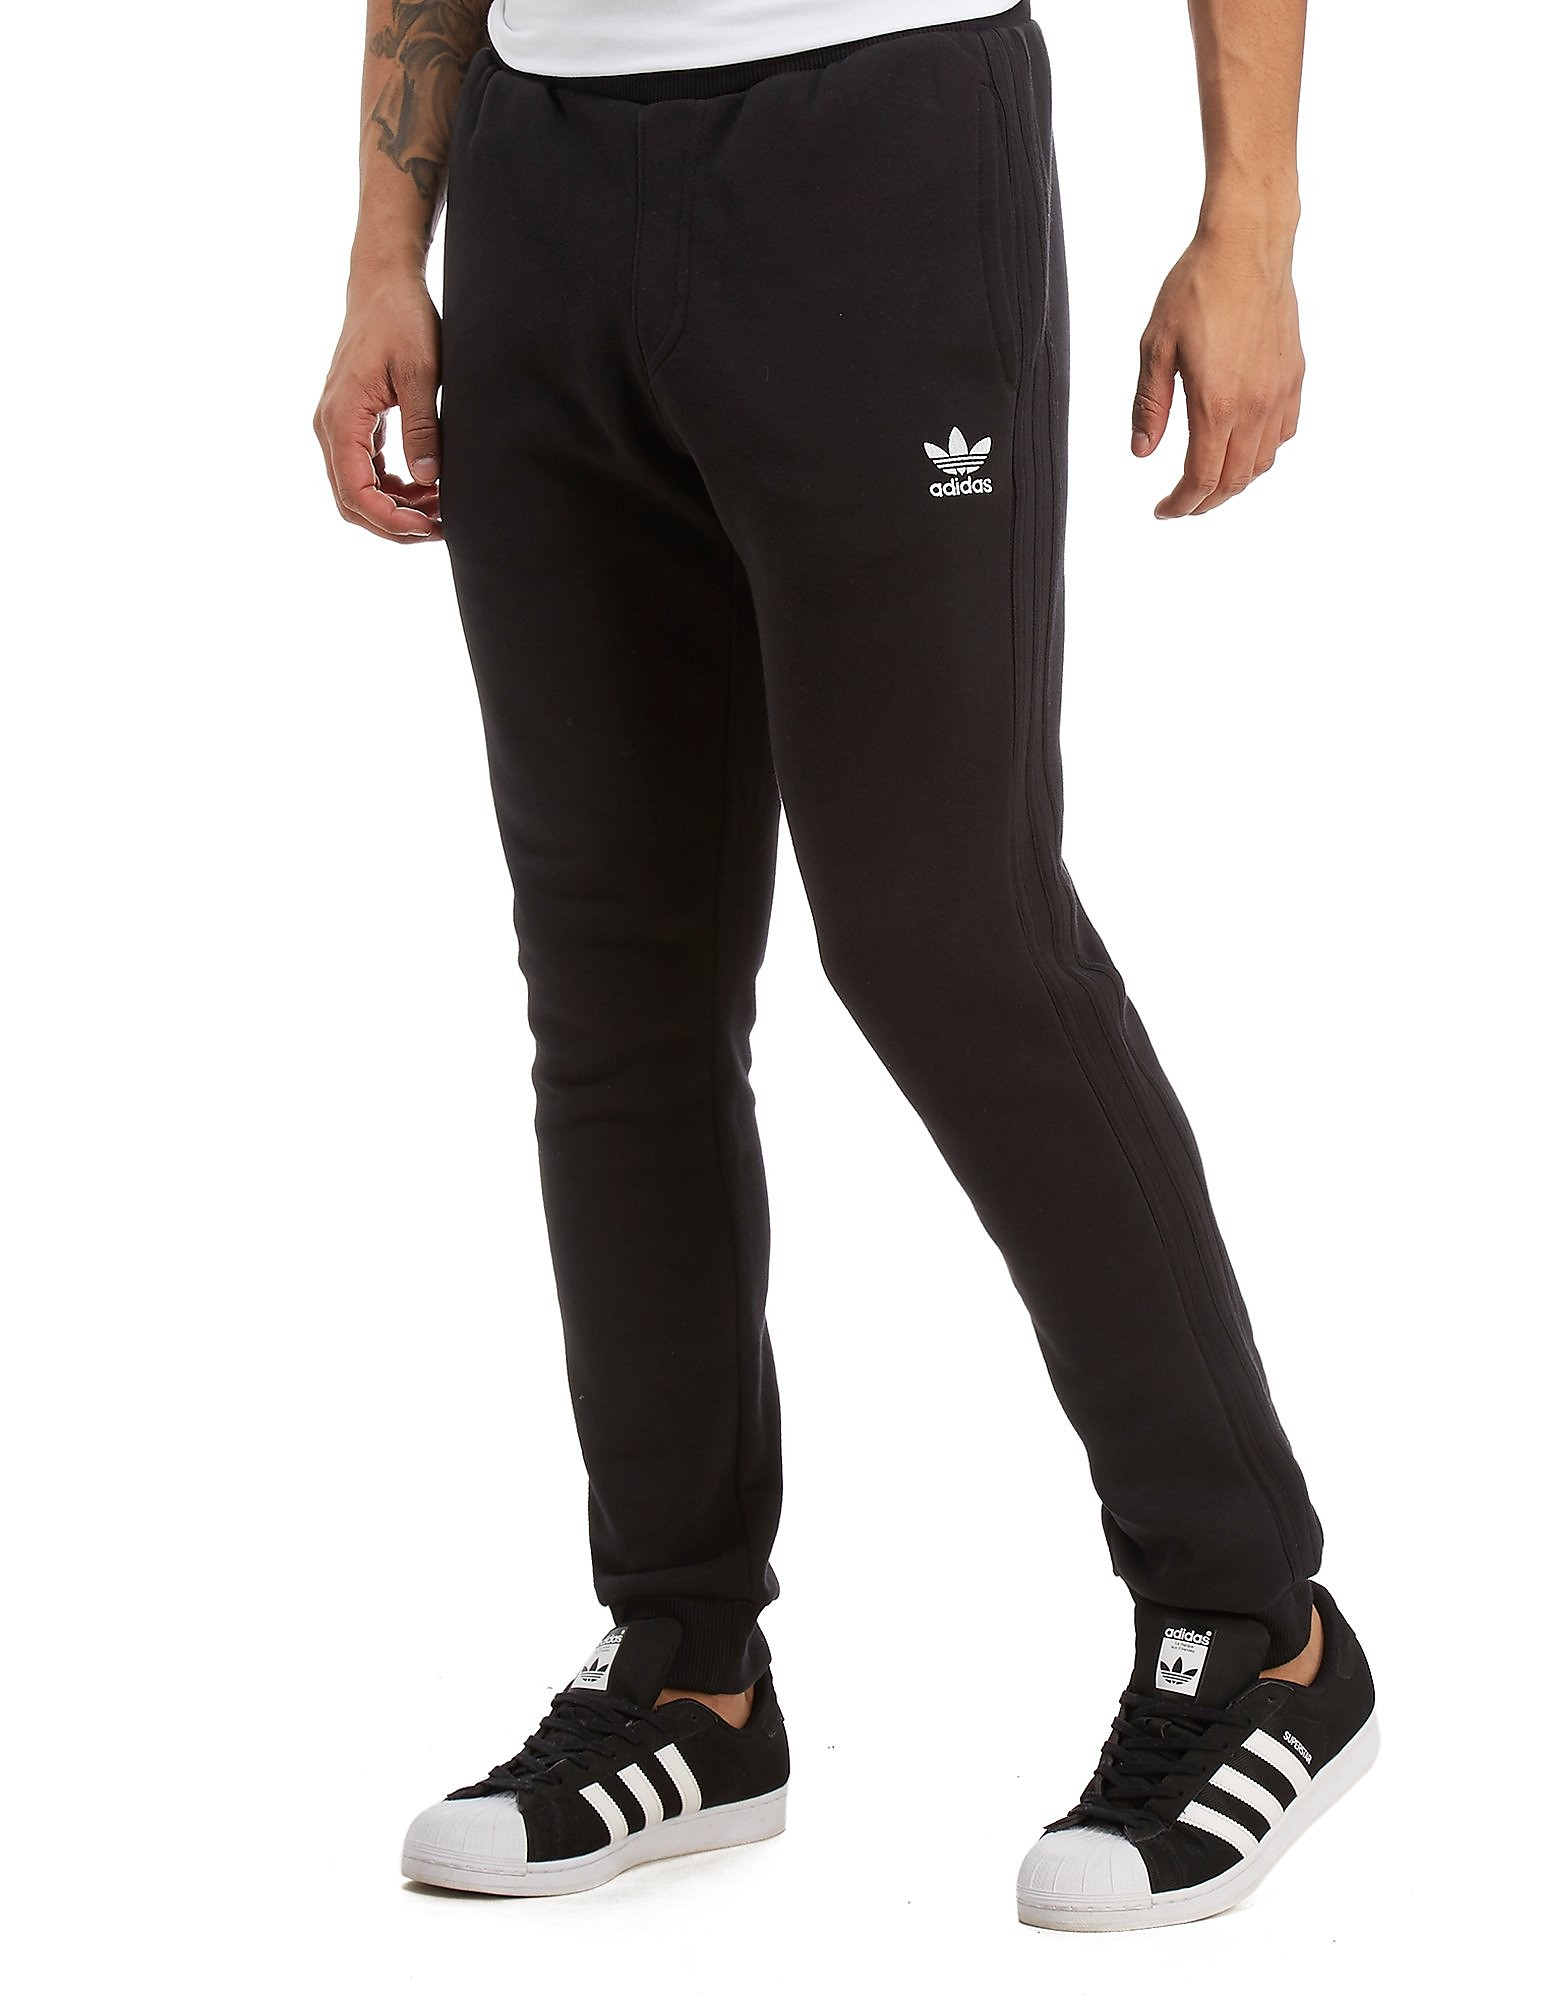 adidas Originals Trefoil Full Length Pants